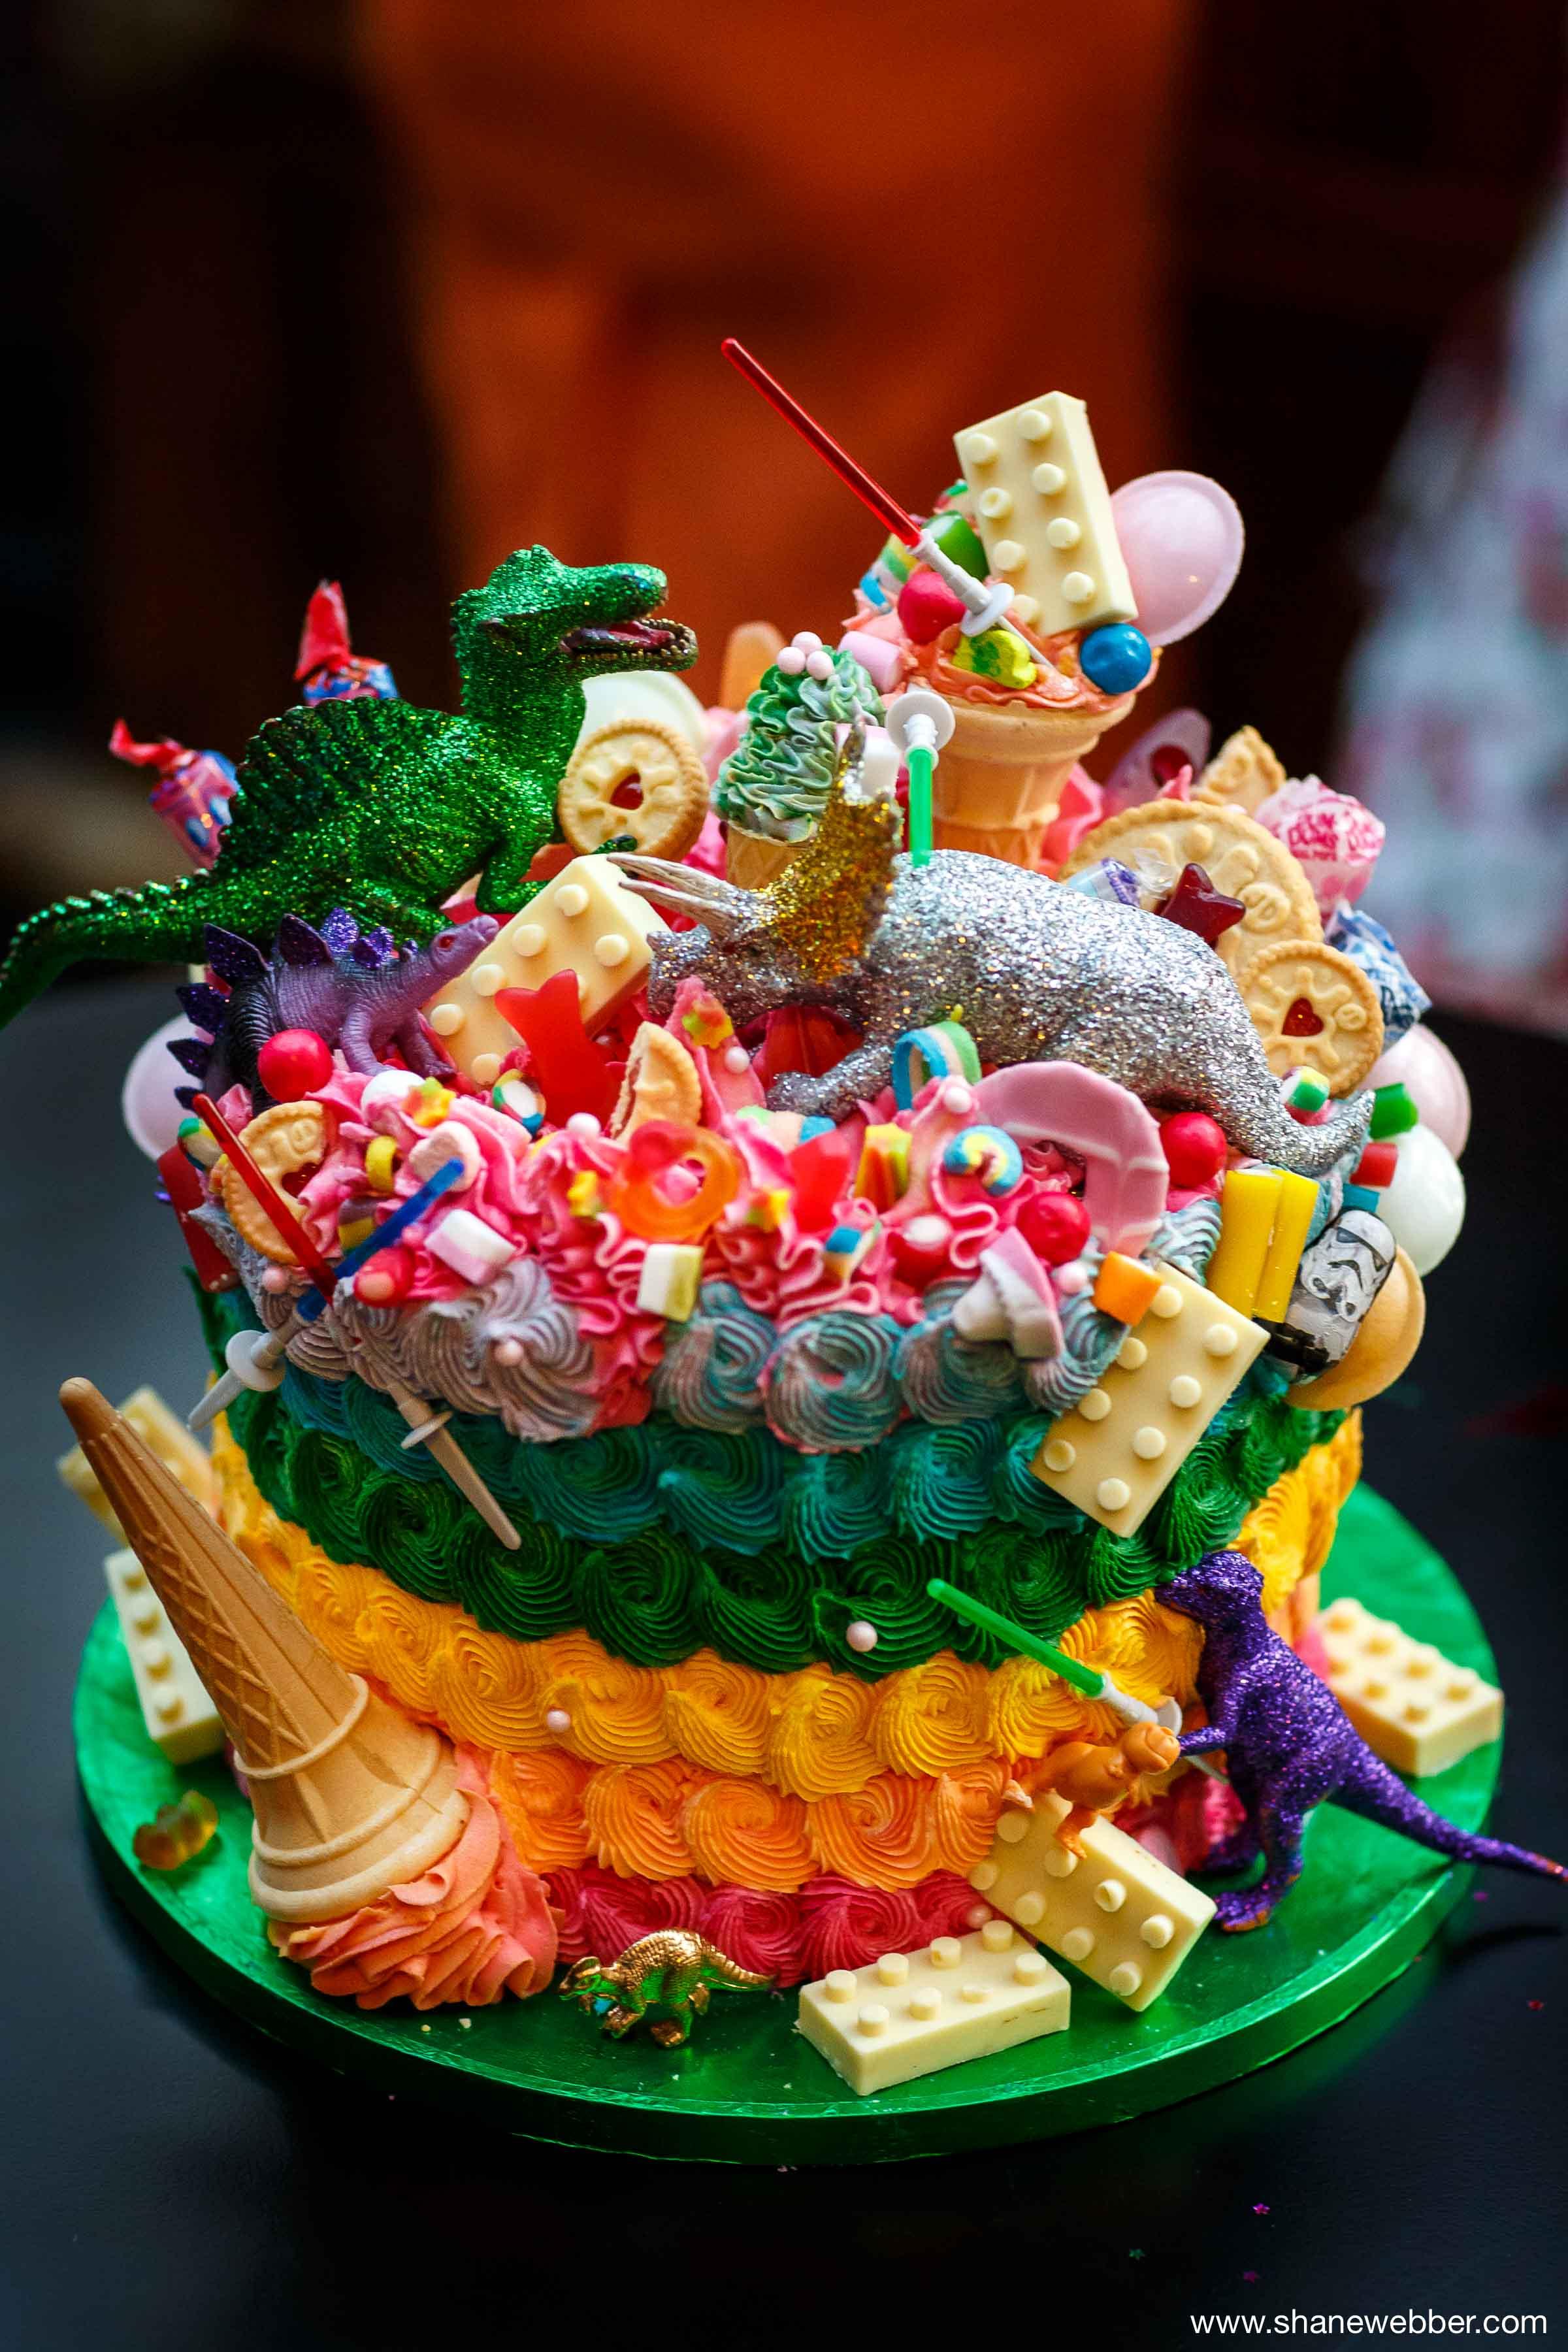 Jurassic Park style dinosaur wedding cake